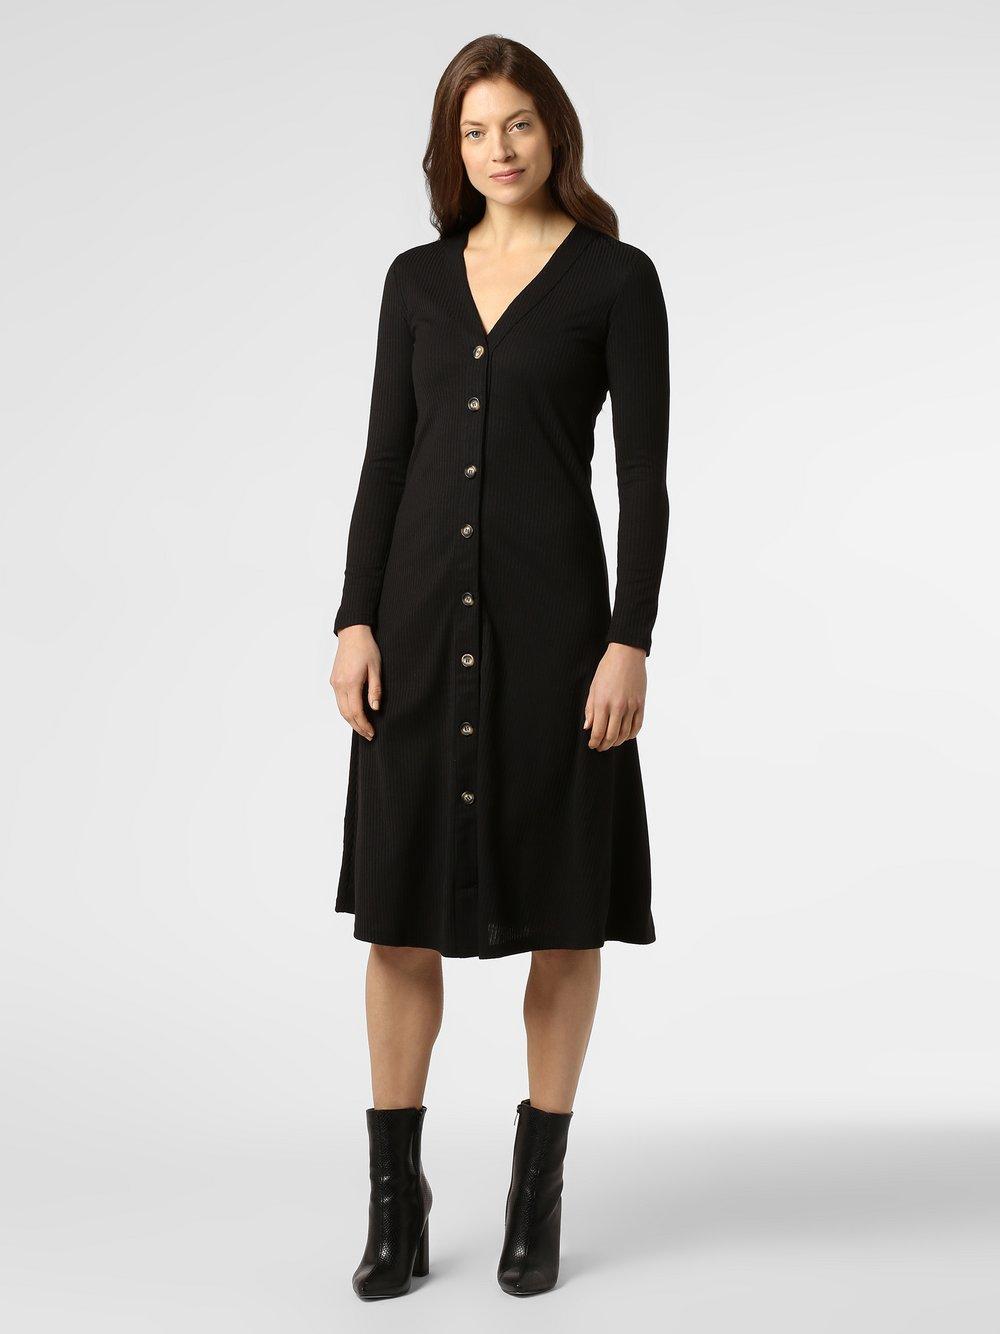 Minimum – Sukienka damska – Gudruna, czarny Van Graaf 456337-0001-09900